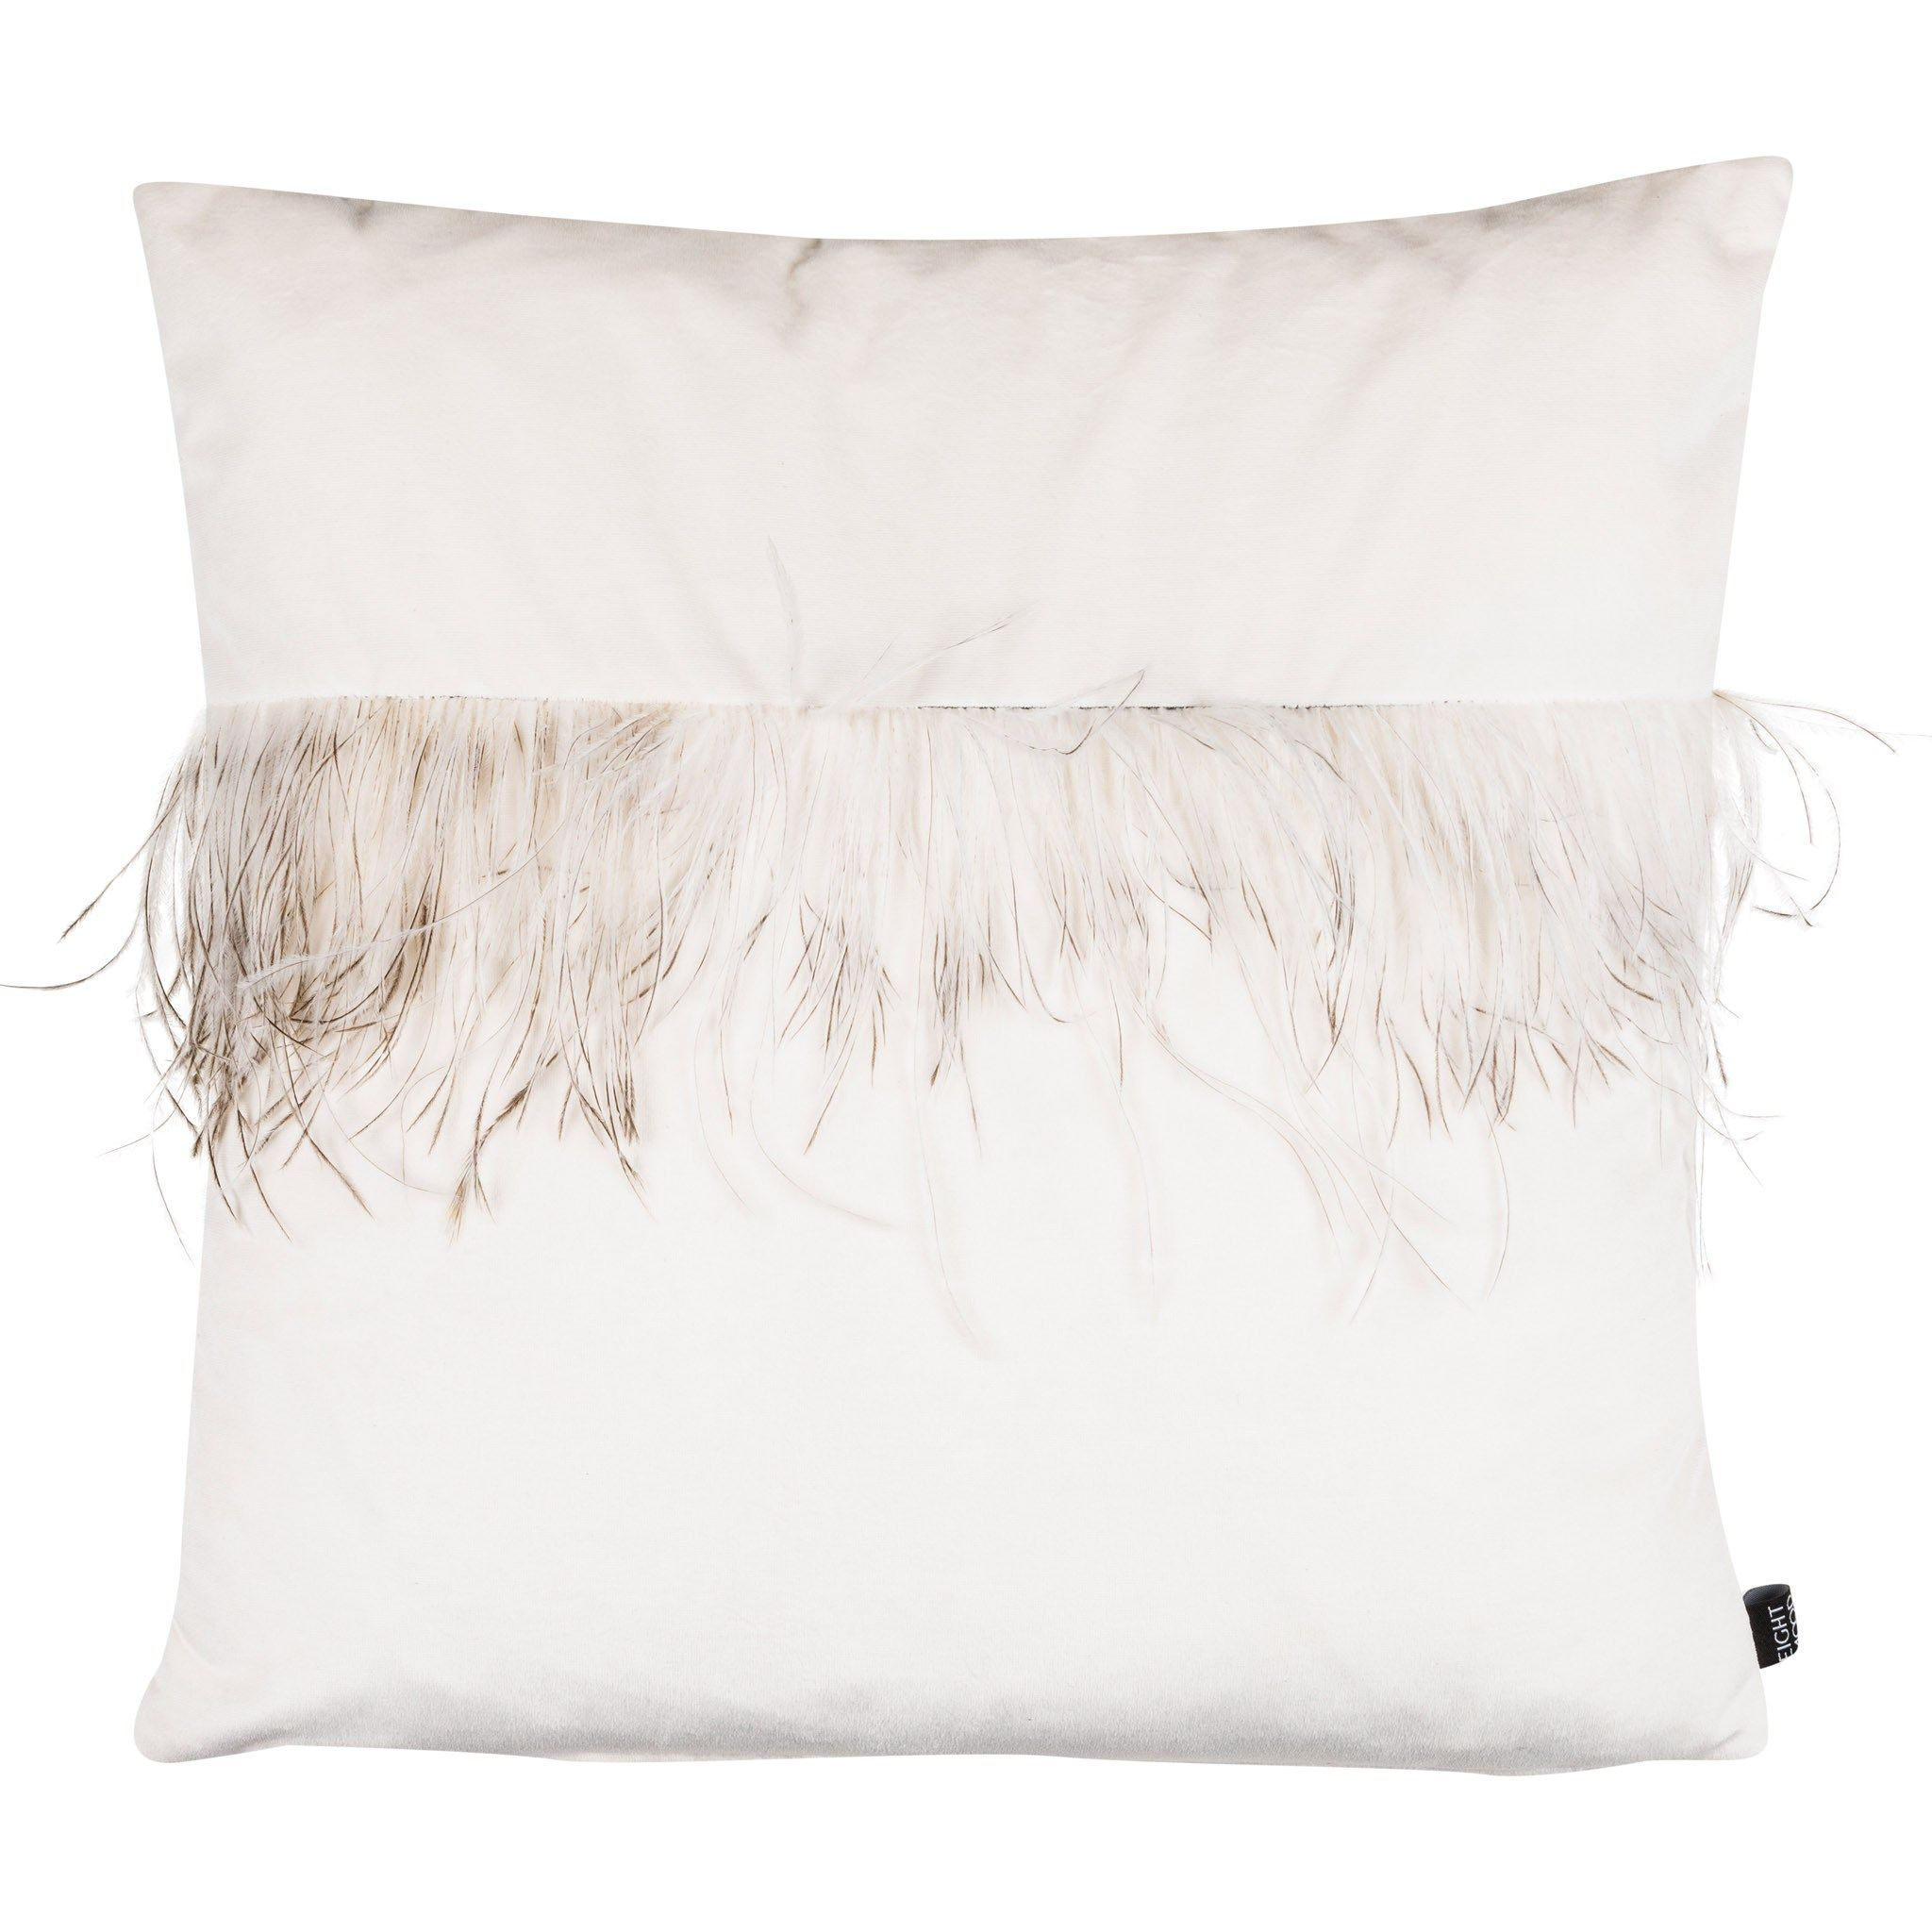 en feather pillow parnak cm elfenbein hungarian goose small kft down inch x pillows